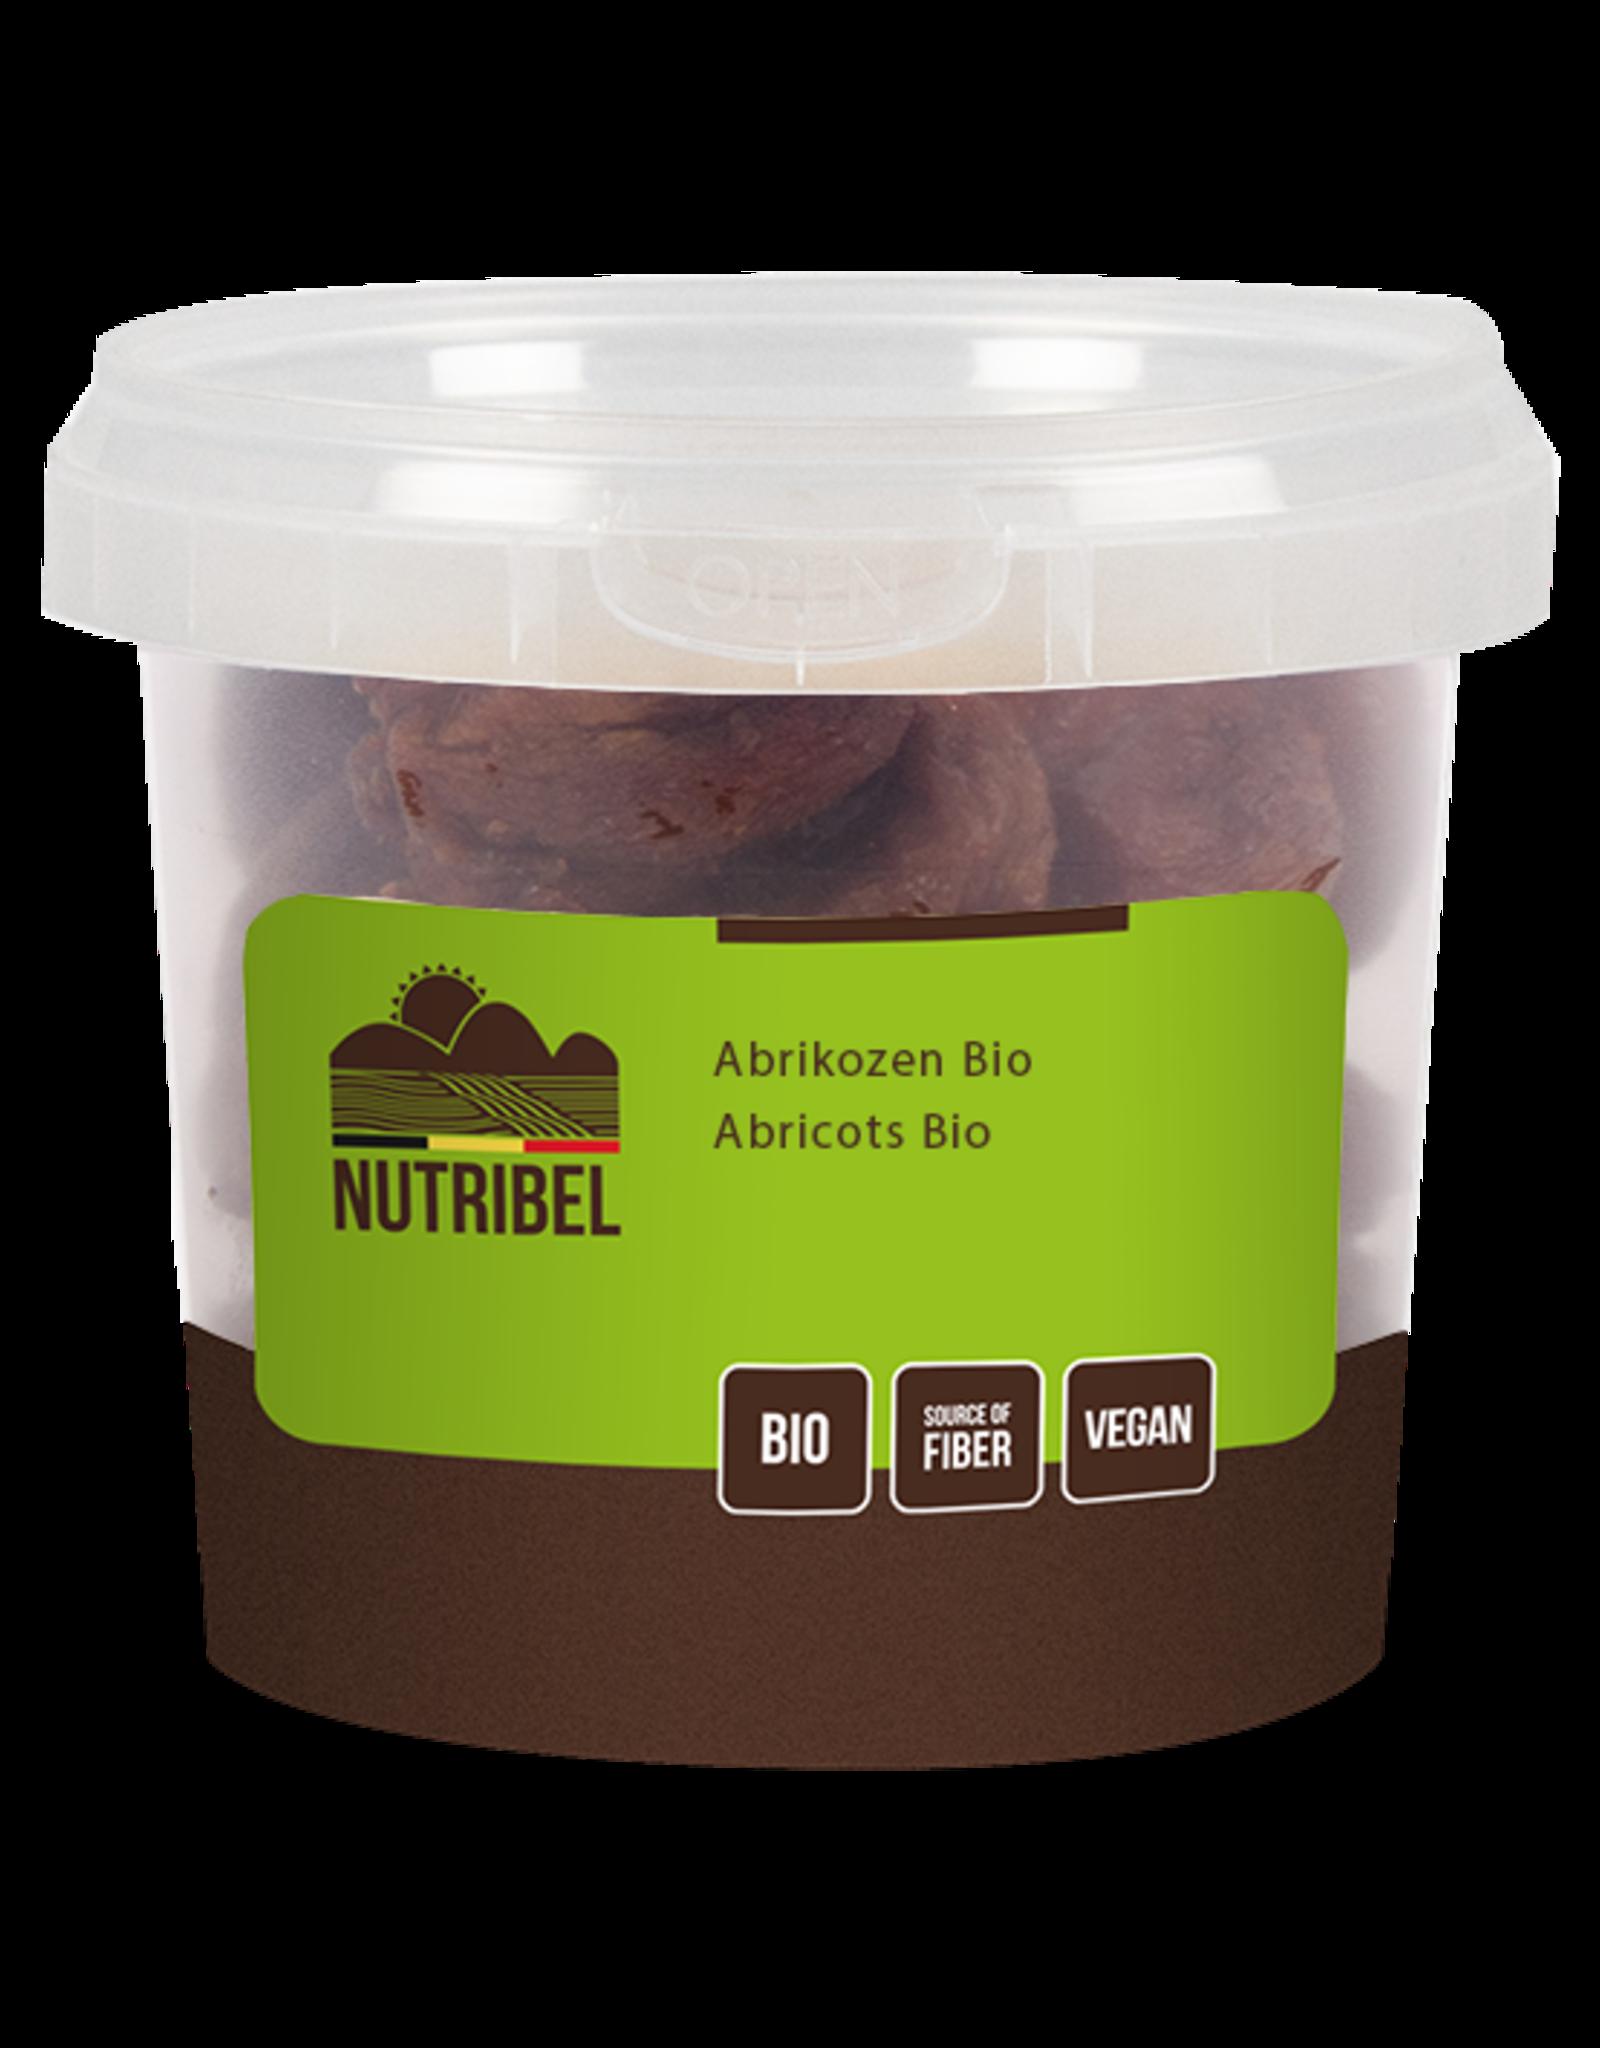 Nutribel Abricots bio 200g